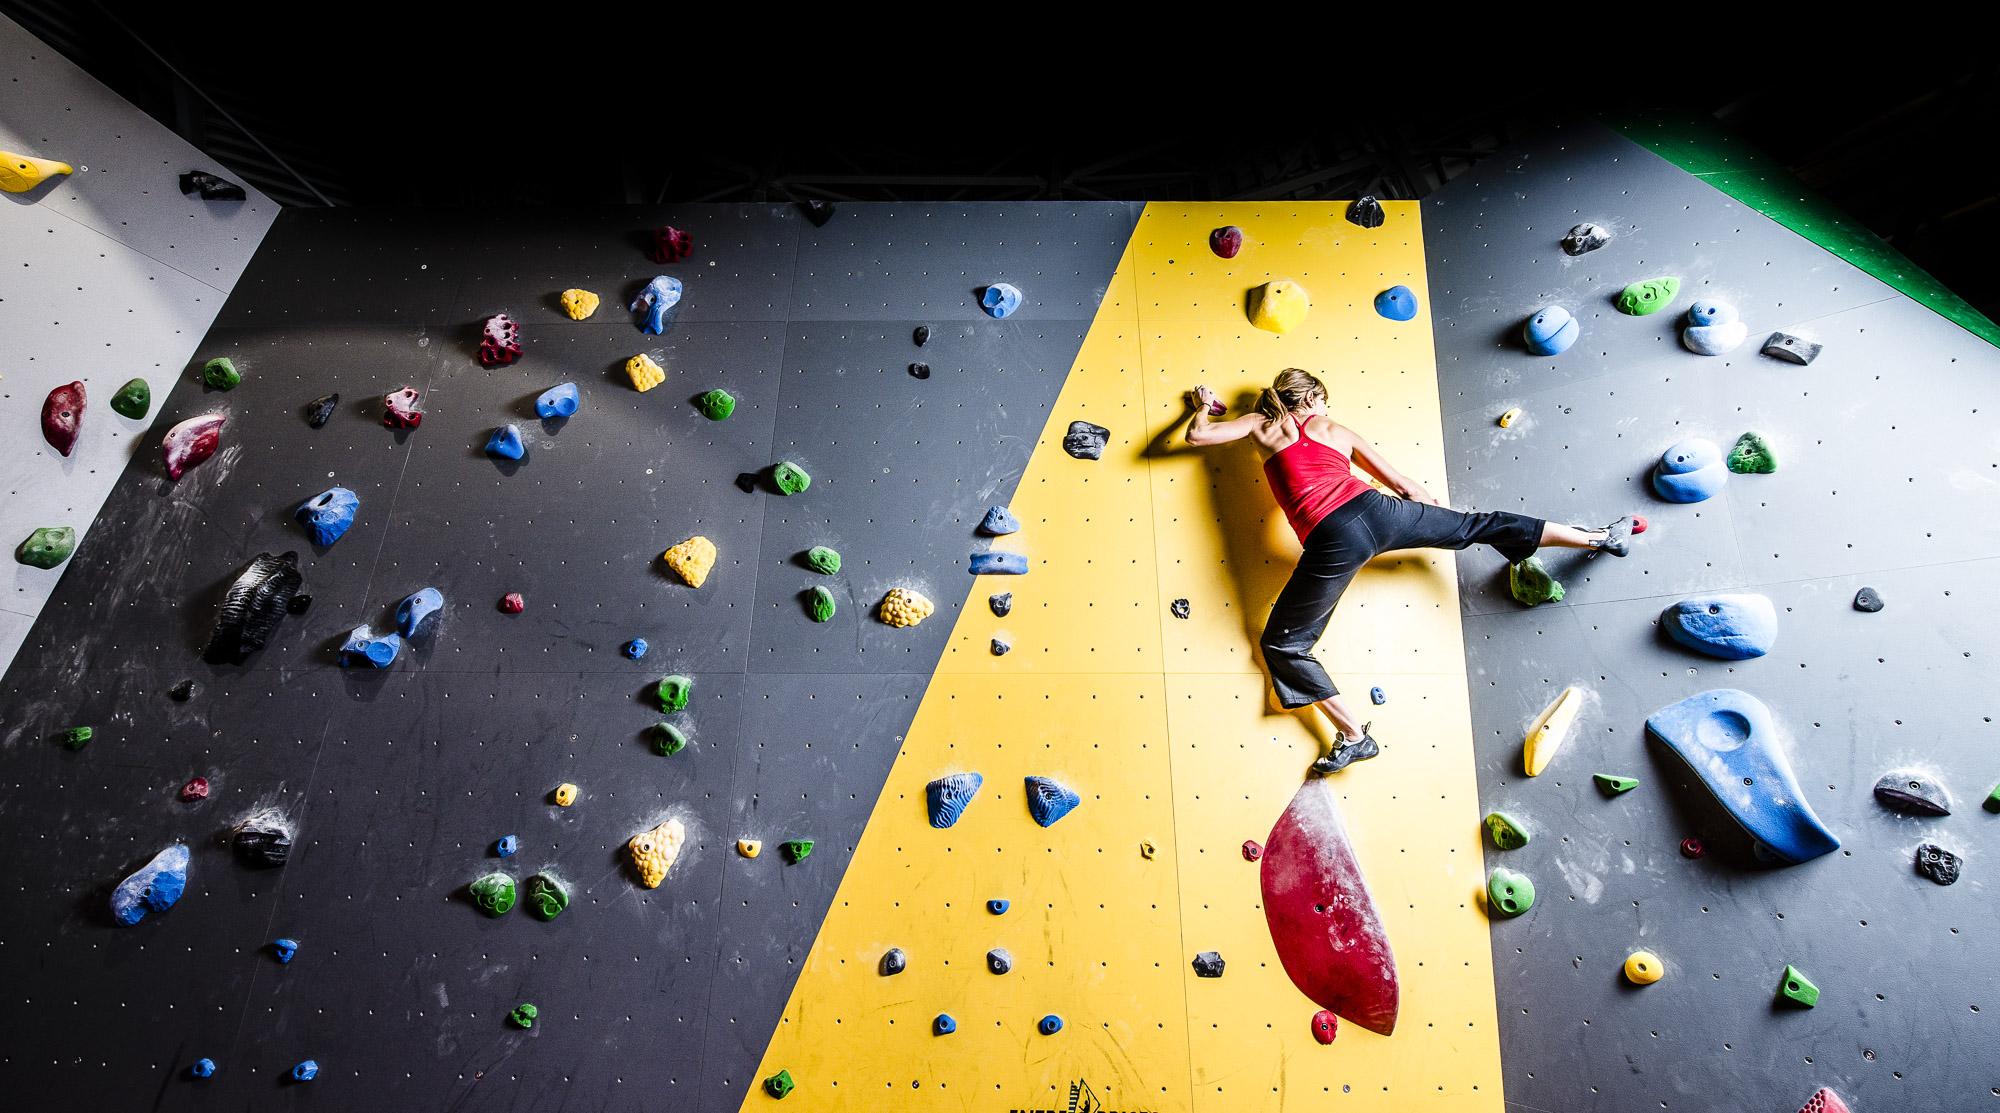 u_of_a_climbing_gym-10.jpg